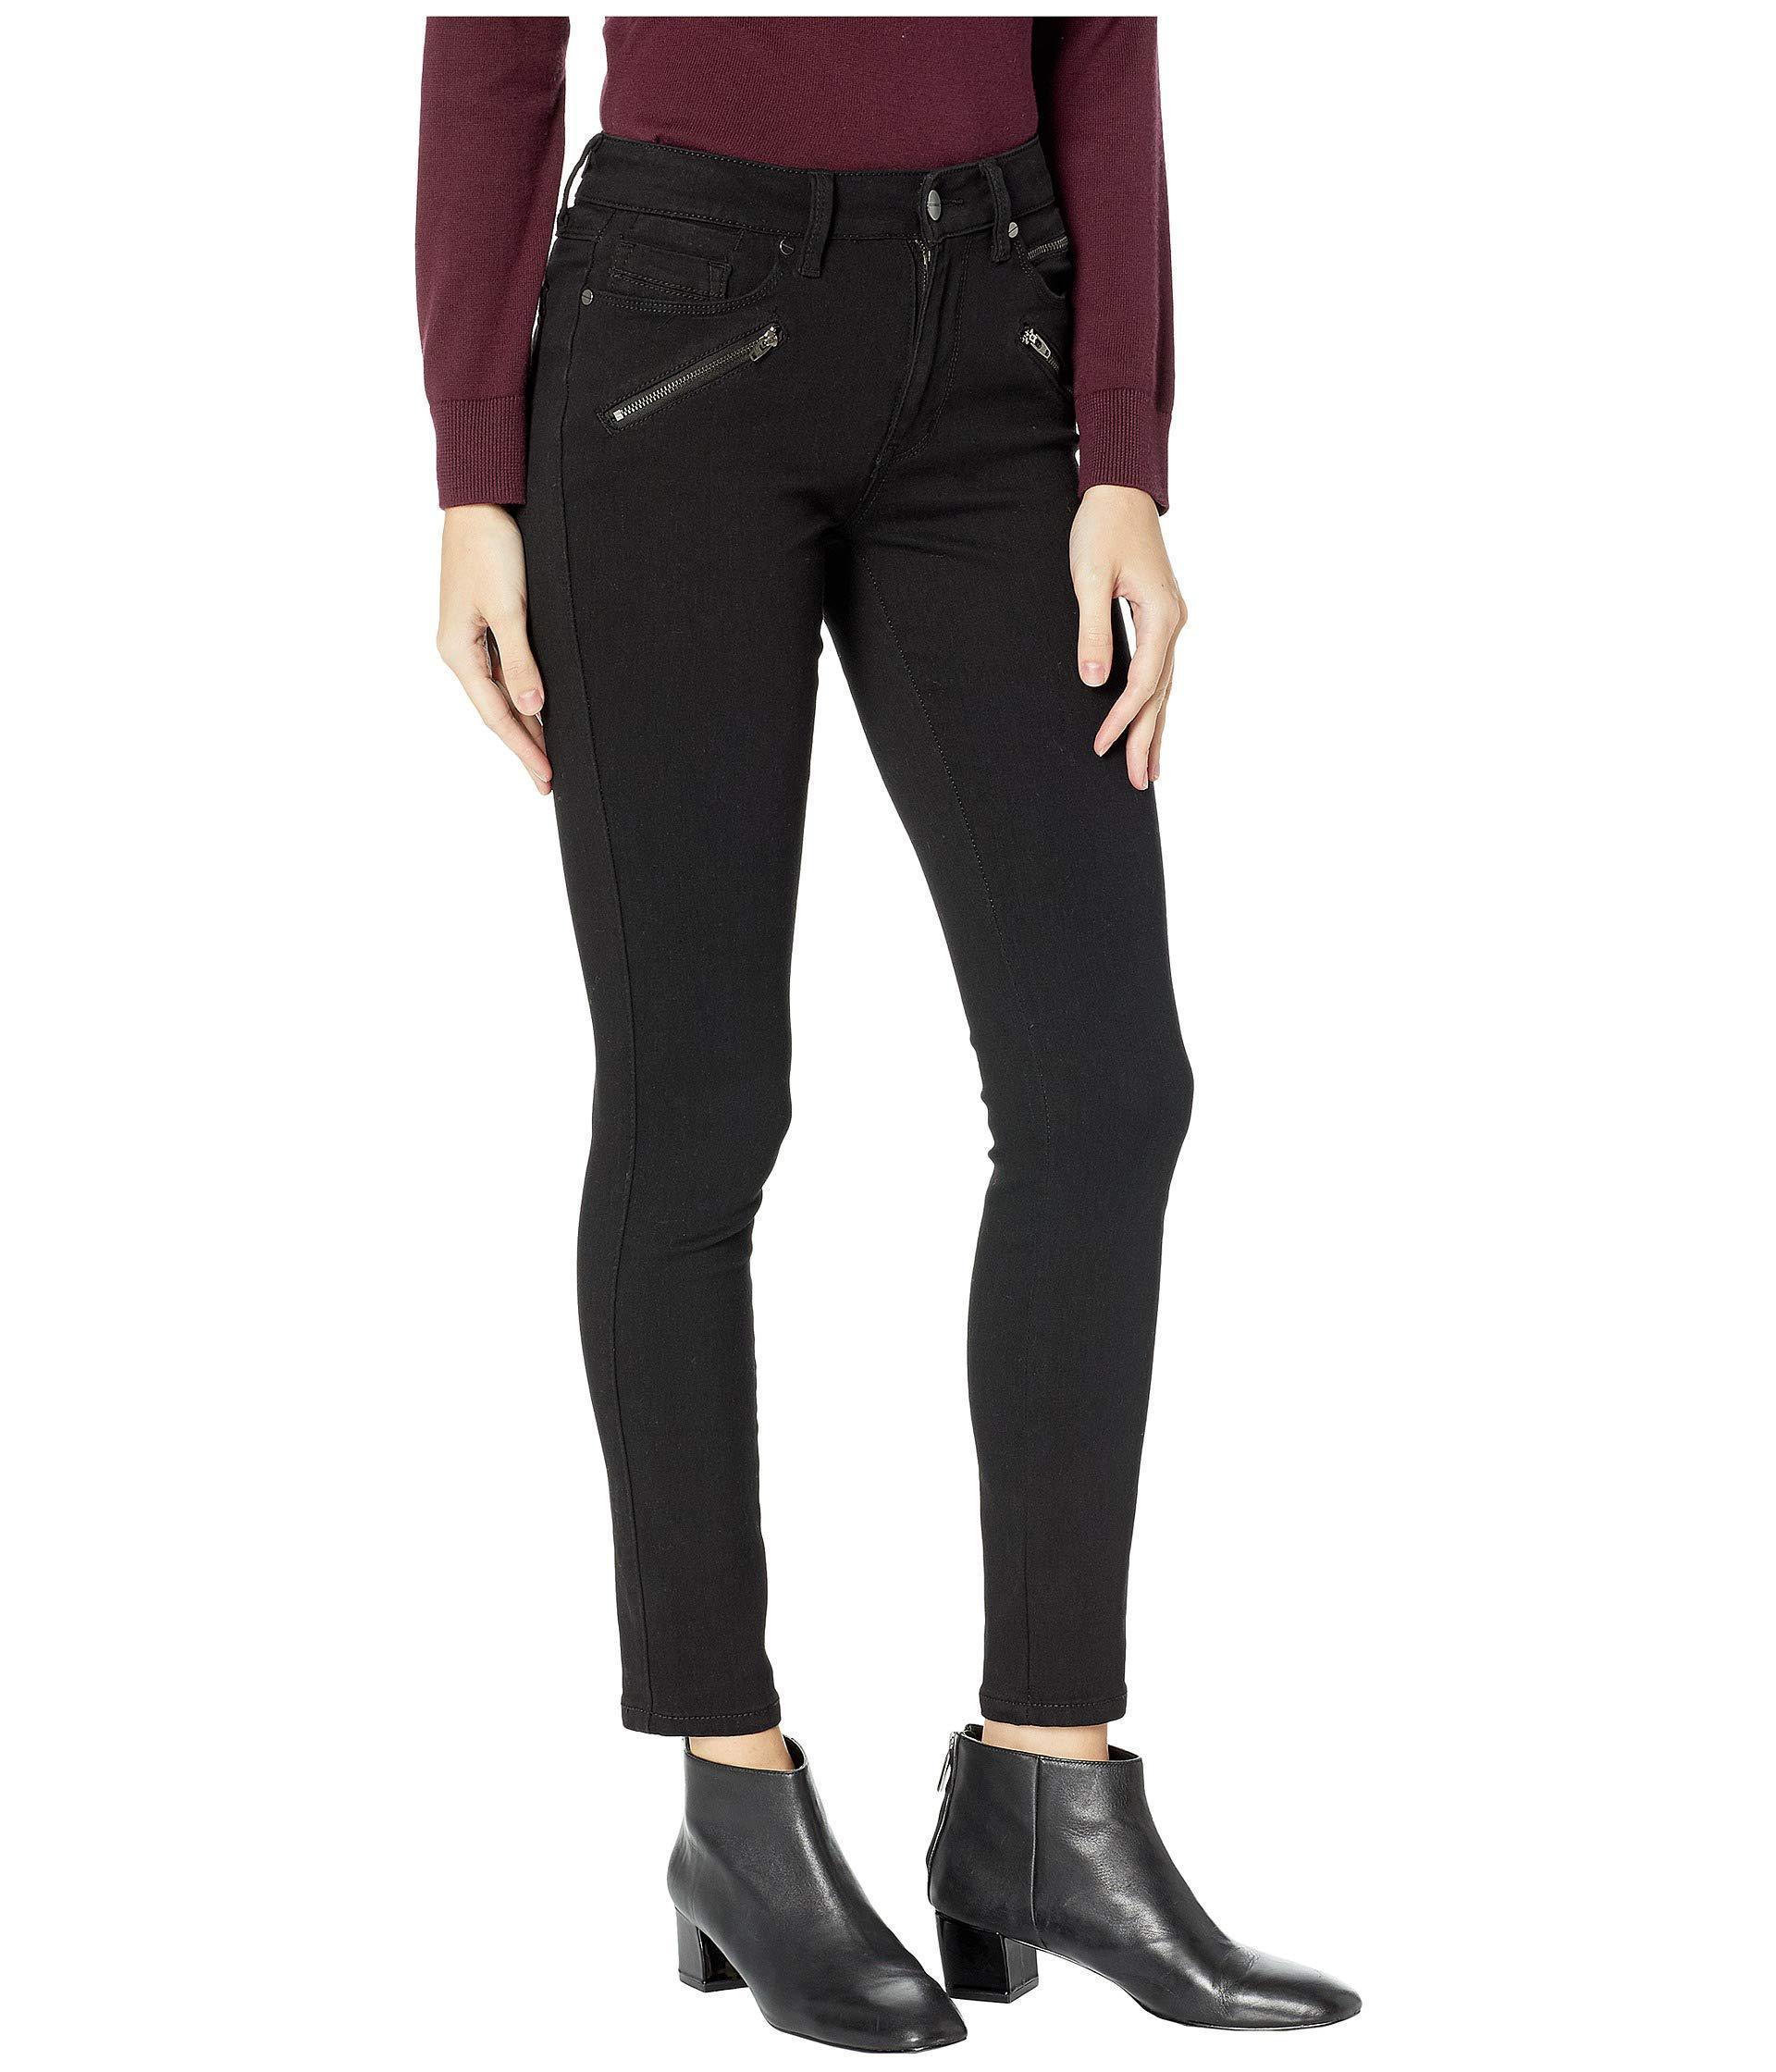 a25ad645524 Kenneth Cole - Jess Moto Skinny In Black (black) Women s Jeans - Lyst. View  fullscreen